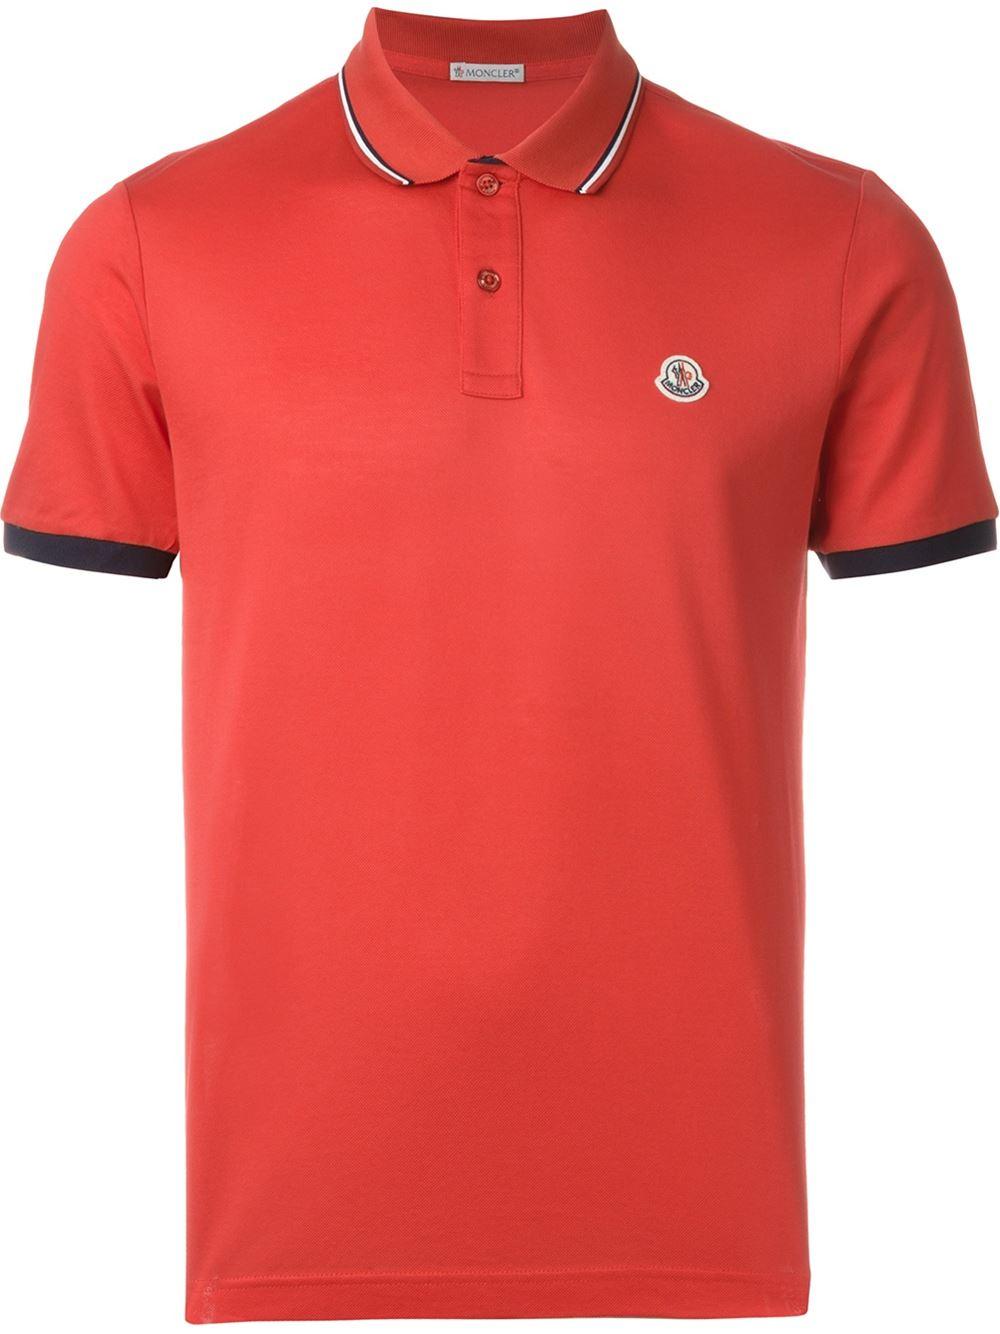 lyst moncler logo polo shirt men cotton xs in pink for men. Black Bedroom Furniture Sets. Home Design Ideas